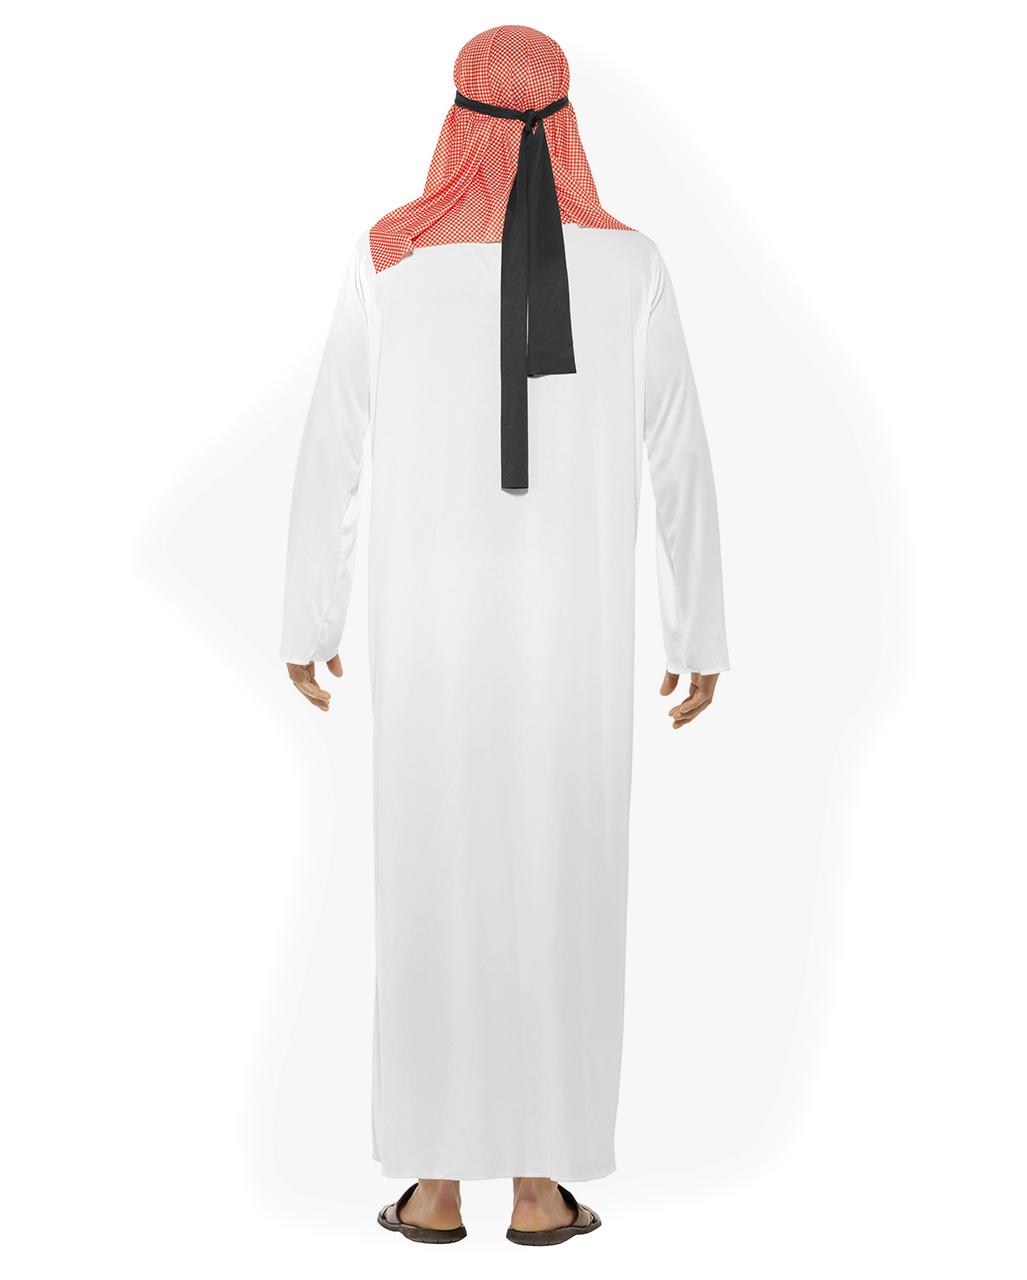 orientalisches araber kost m f r den karnevalsumzug karneval universe. Black Bedroom Furniture Sets. Home Design Ideas